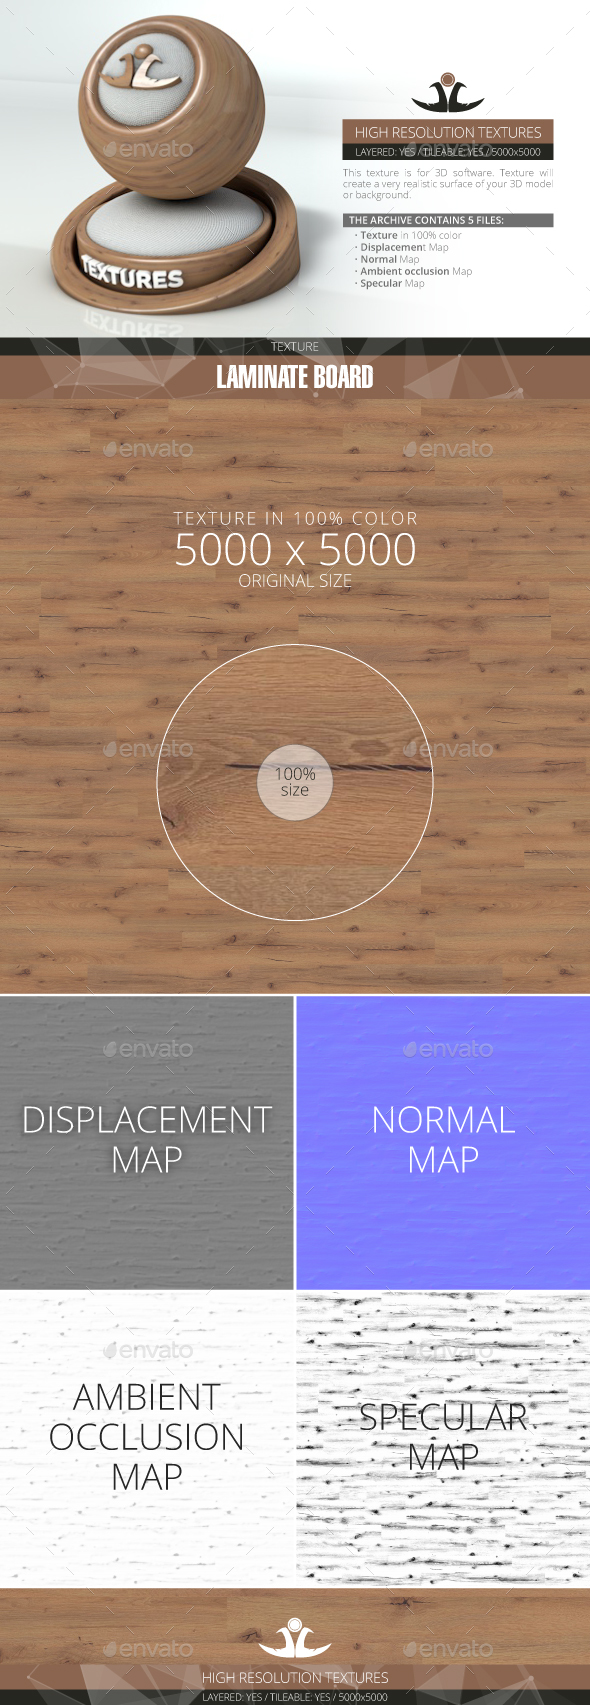 Laminate Board 31 - 3DOcean Item for Sale